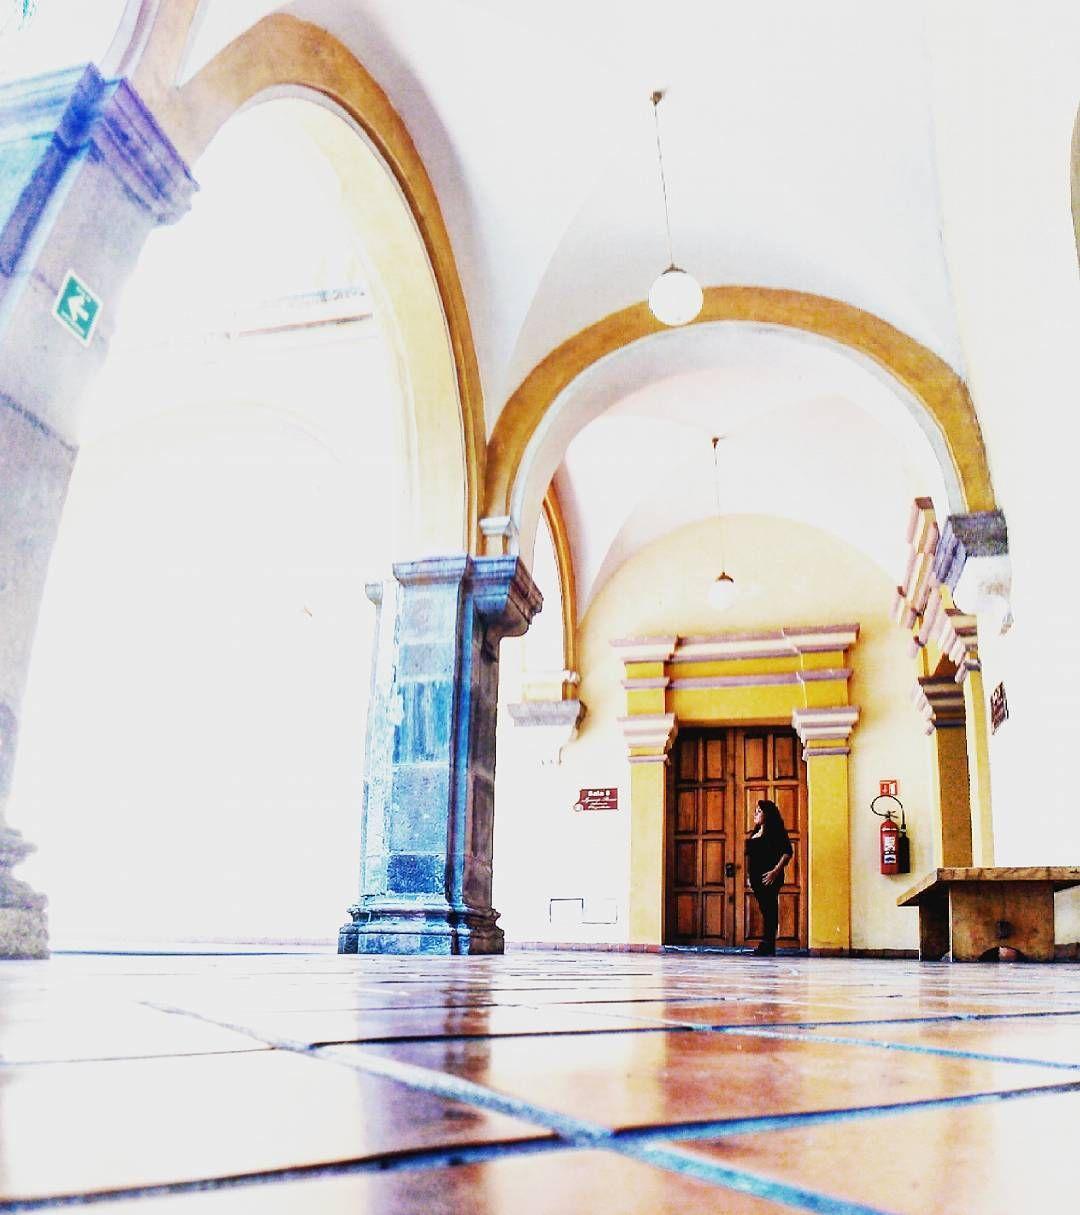 "jmg2304: "" Crees en el paraíso...  #TalentosMex#_Igerscreativos#Mexicanoscreativos#LiranMx#Vivamexicomx#BeginnersMx#Vivemexico#Vive_Mexico#Mexigers#instantefotografico#Proyectomexico#Oratesdemexico#mex_meraki#SoySerendepia#MexicoAlternativo#Mexico_Photolovers#Mexcolorido#mimexico#IgersVeracruz#MexInstantes#Mexico_great_shots#Citymex#LOVES_LATINO#LOVES_VERACRUZ#INSTAMEXICANOS#pasionxveracruz#Turismo_mexico32#mexicoandando#ingeniummex#icu_mexico """